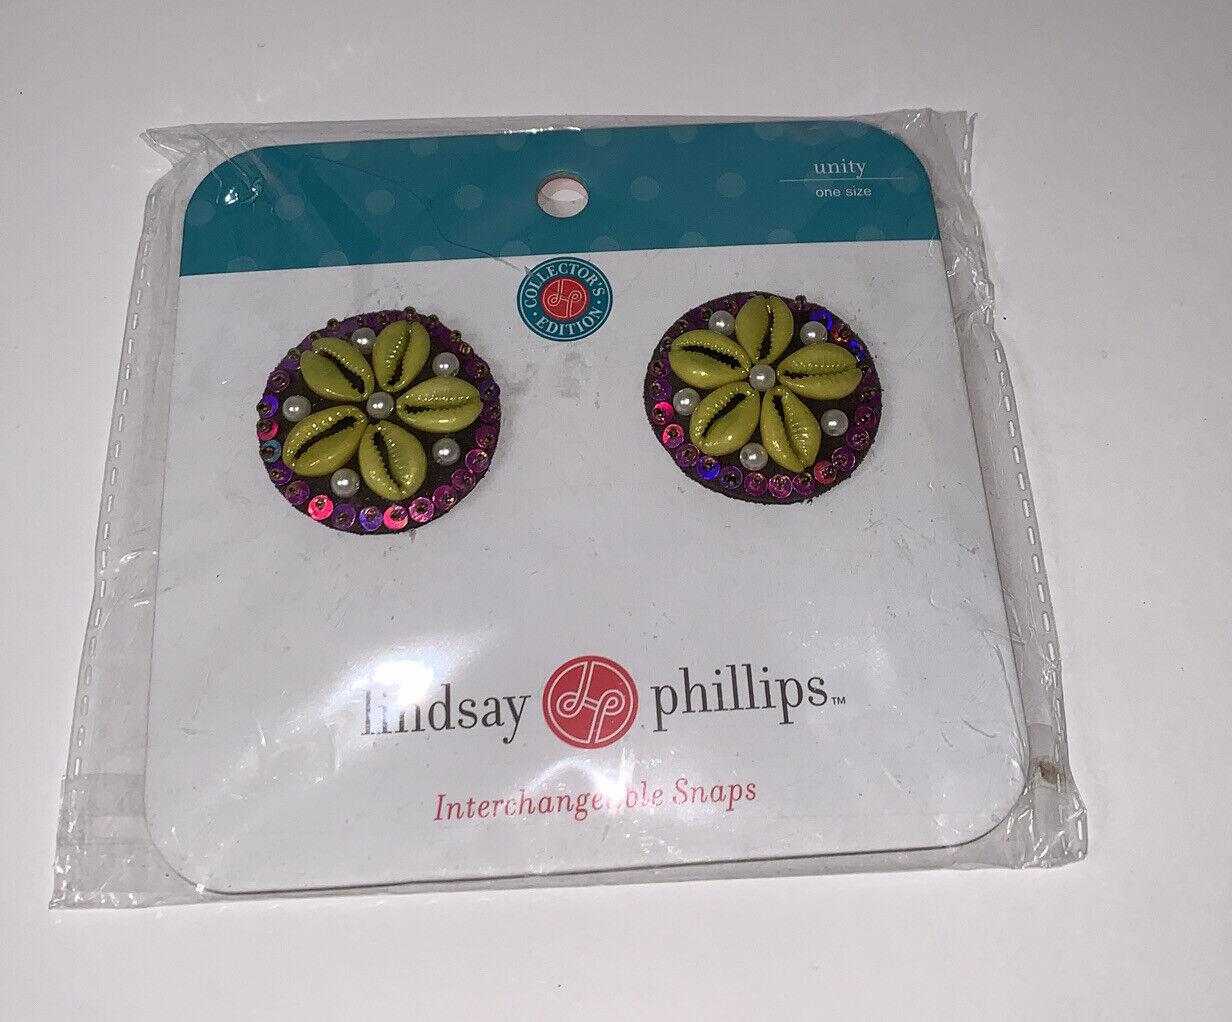 New NIP Lindsay Phillips Snaps Unity Green Purple Shells Sequins